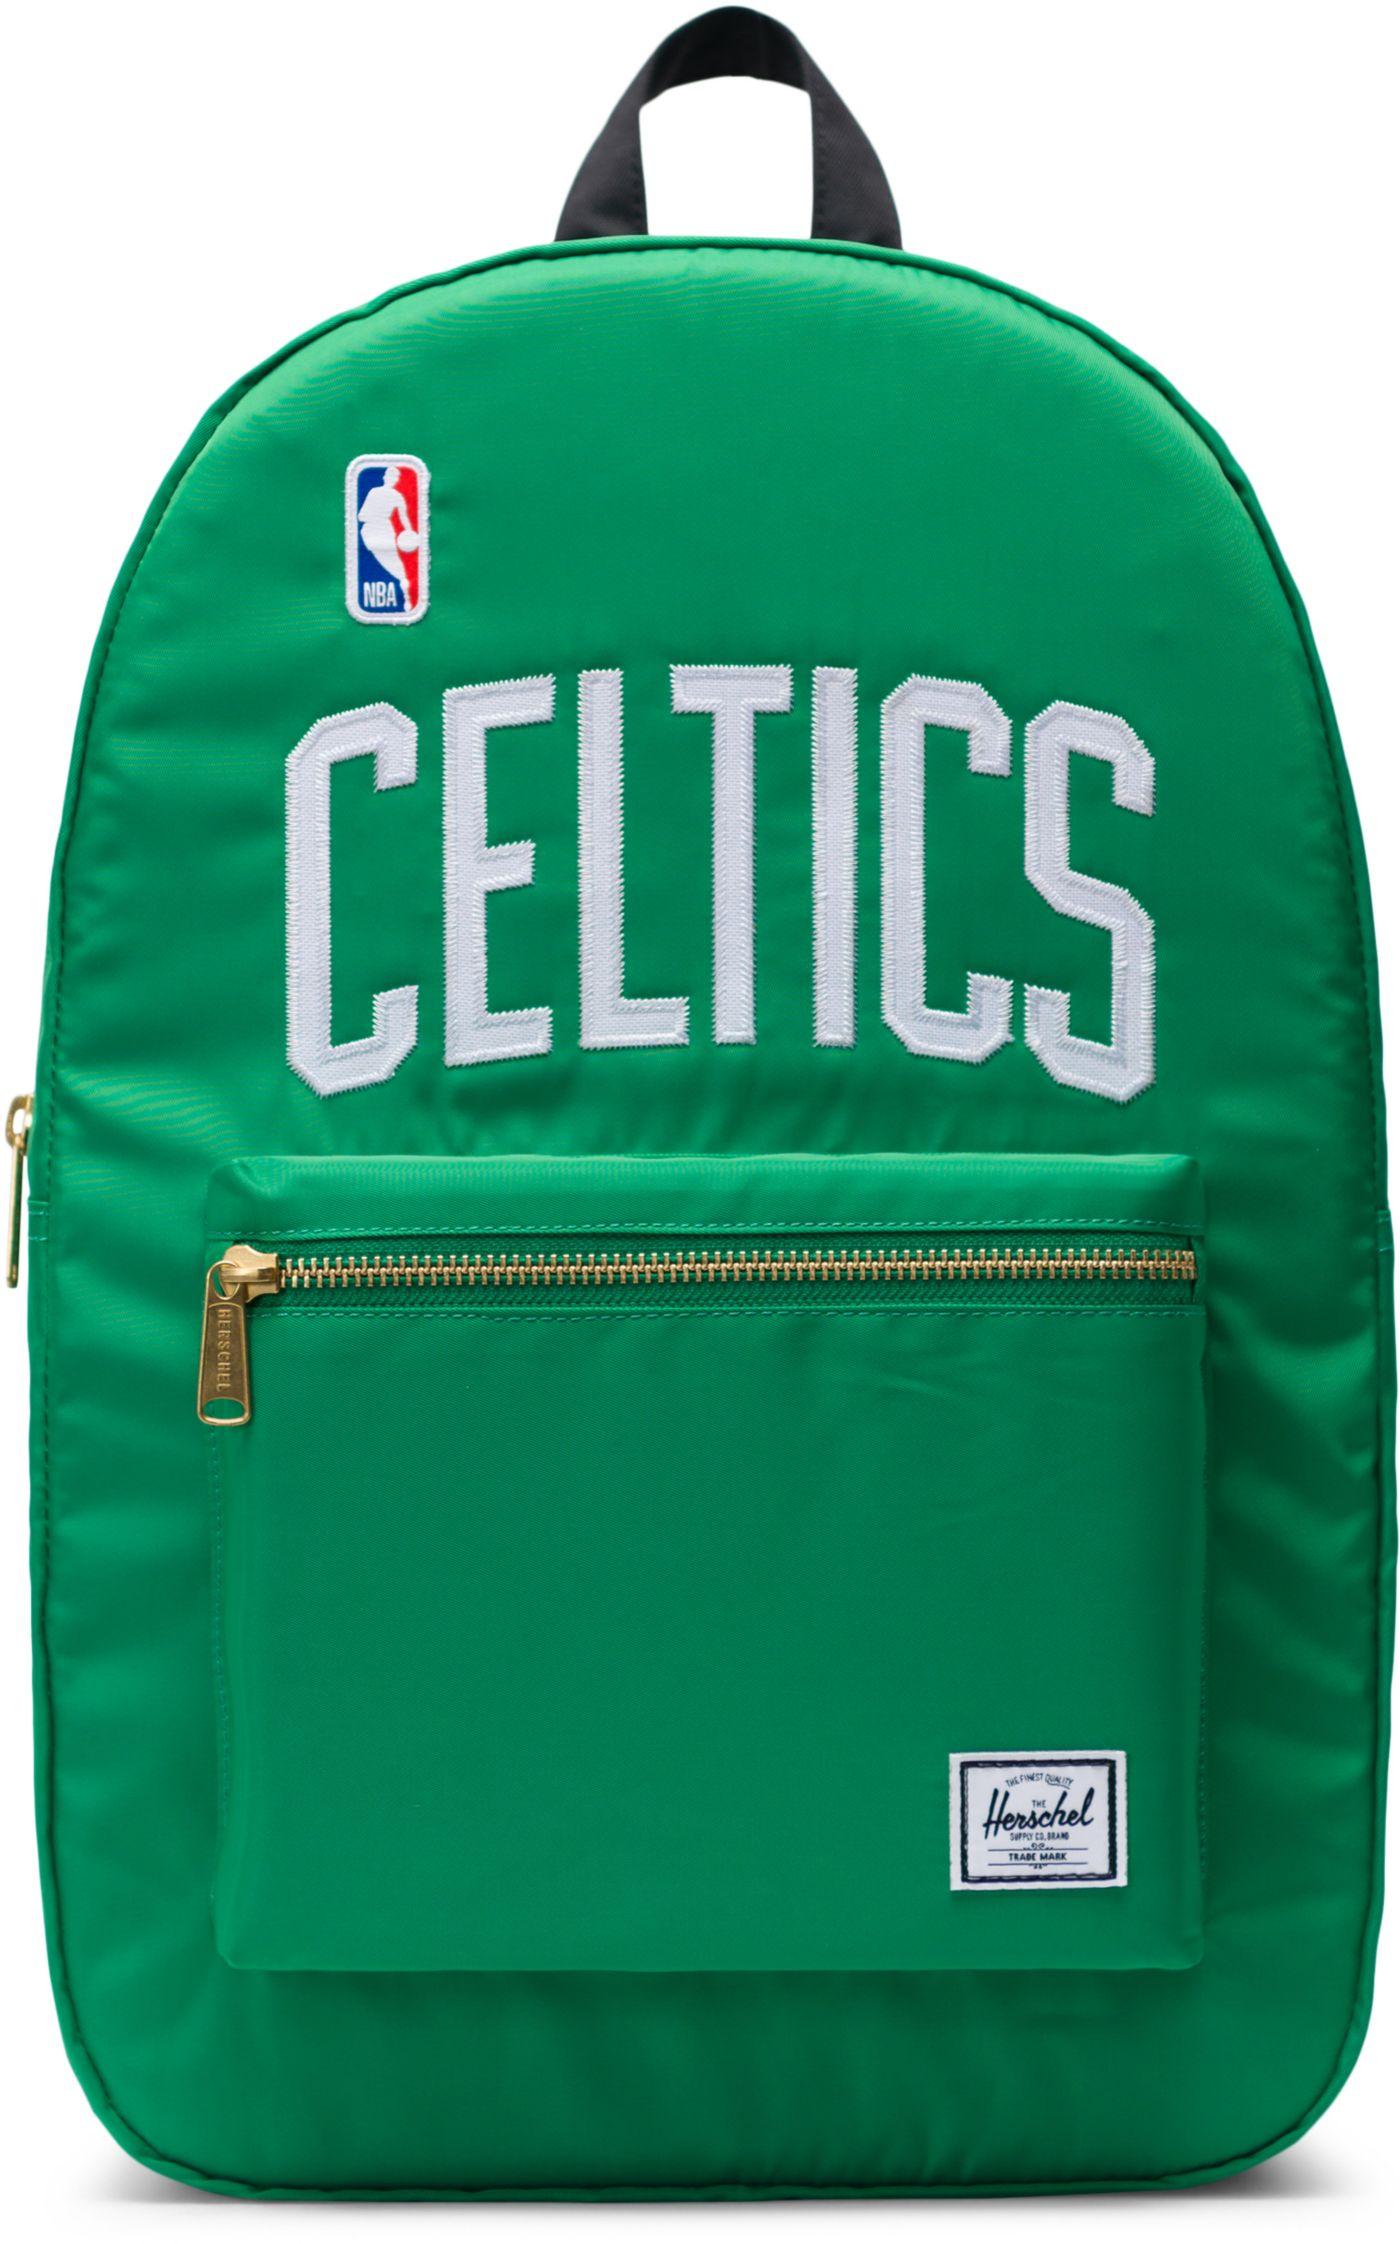 Herschel Boston Celtics Green Settlement Backpack